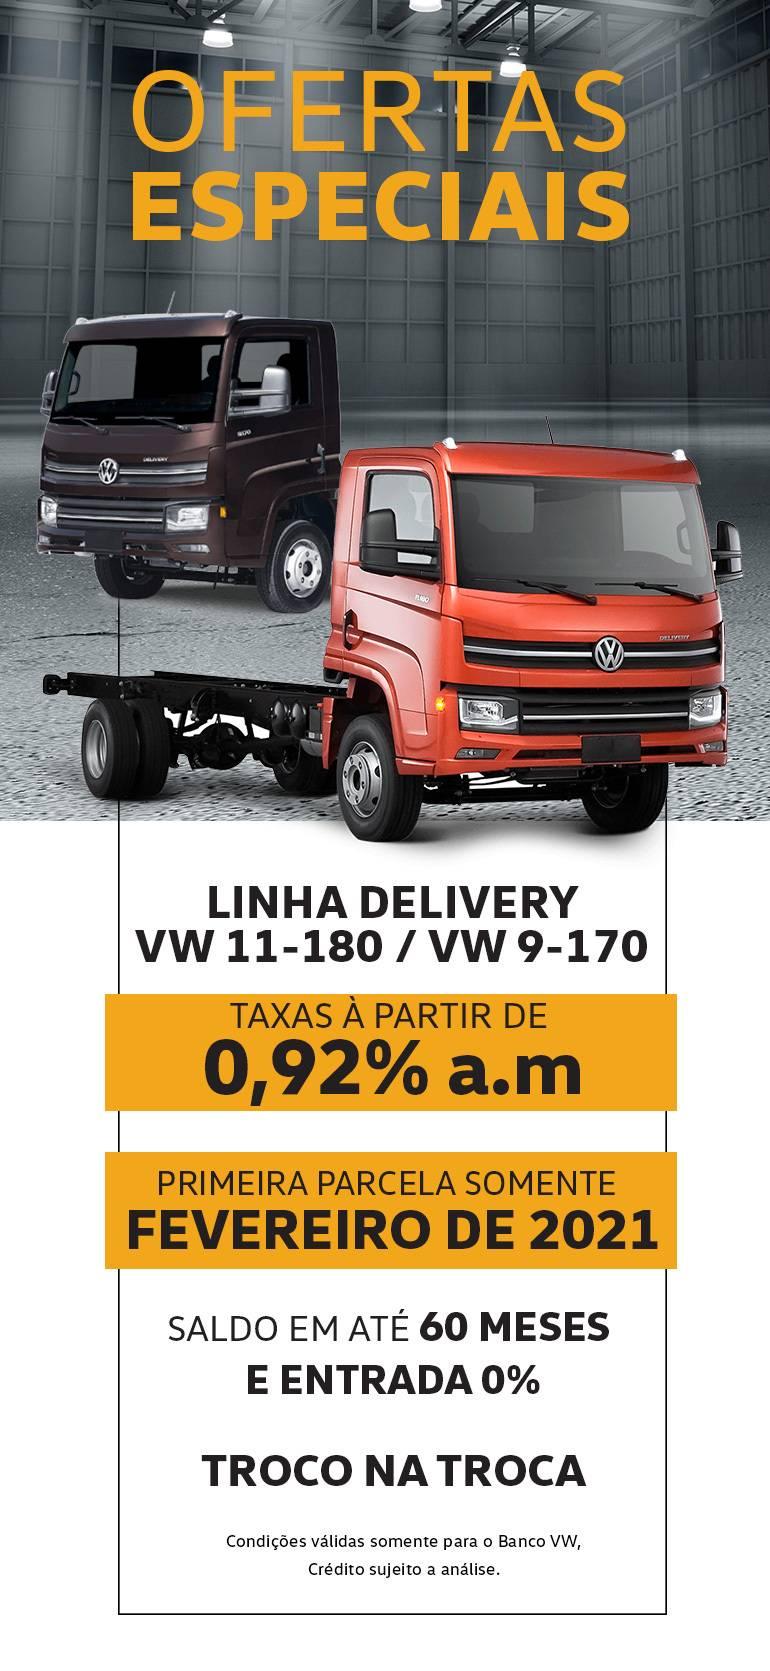 linha delivery